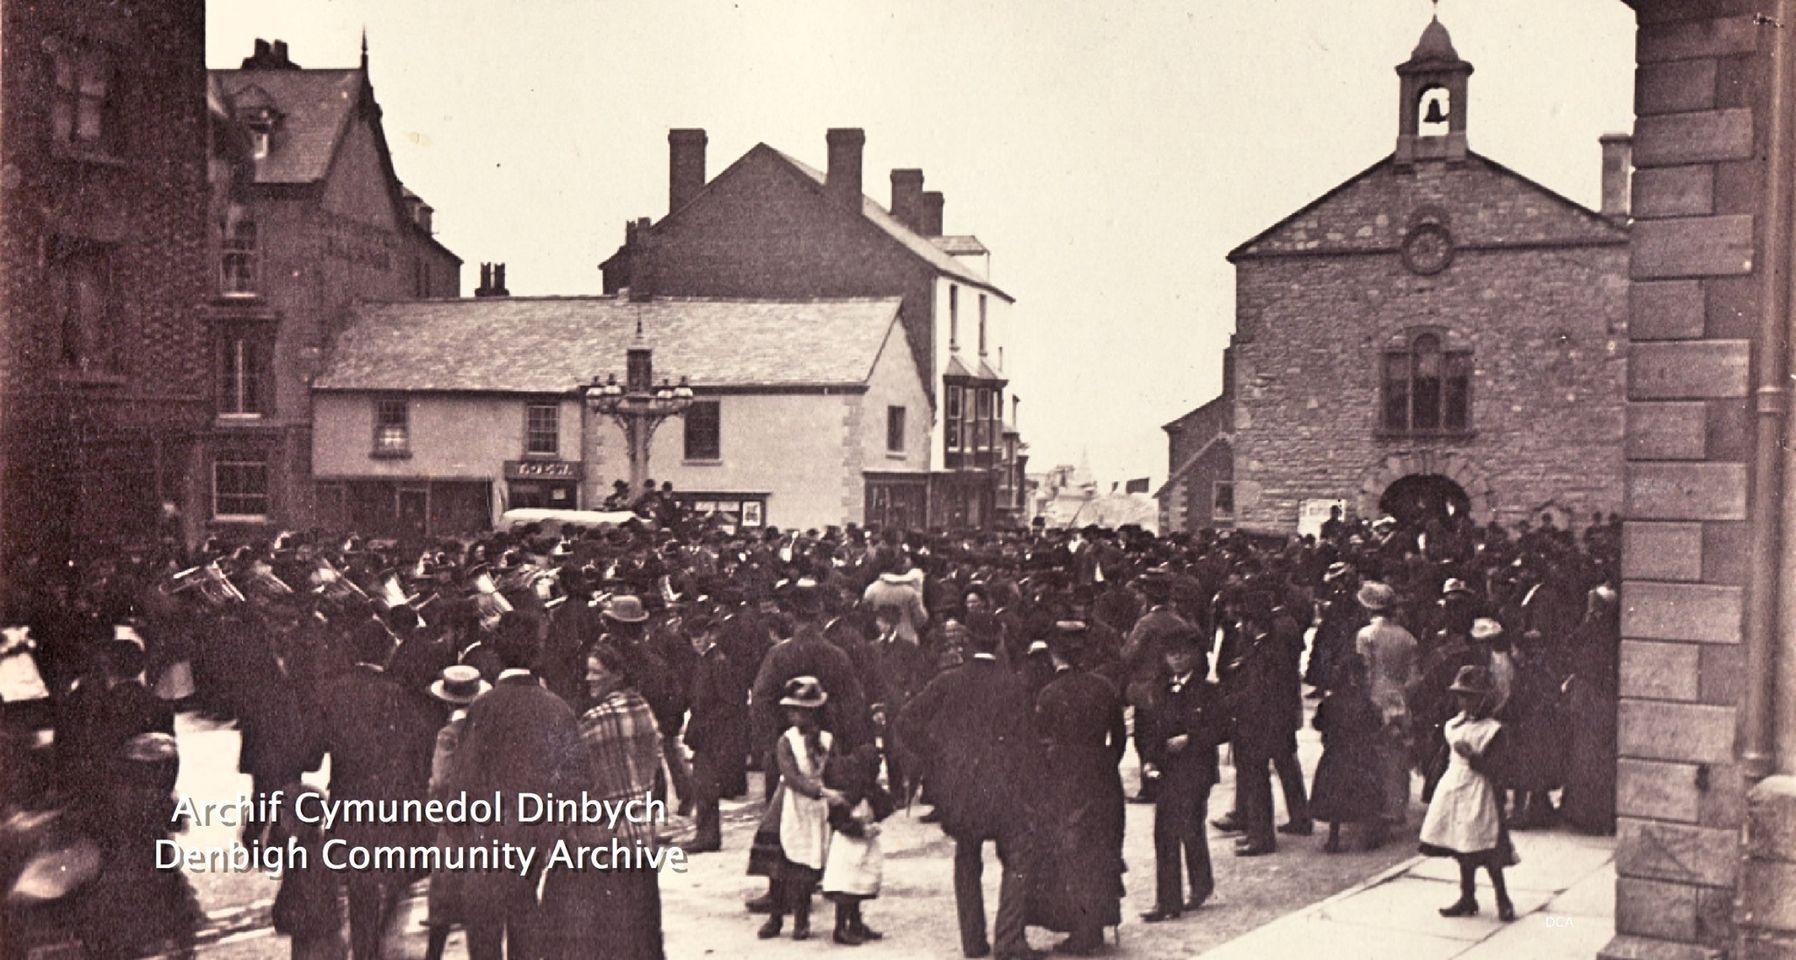 Denbigh Community Archive Group